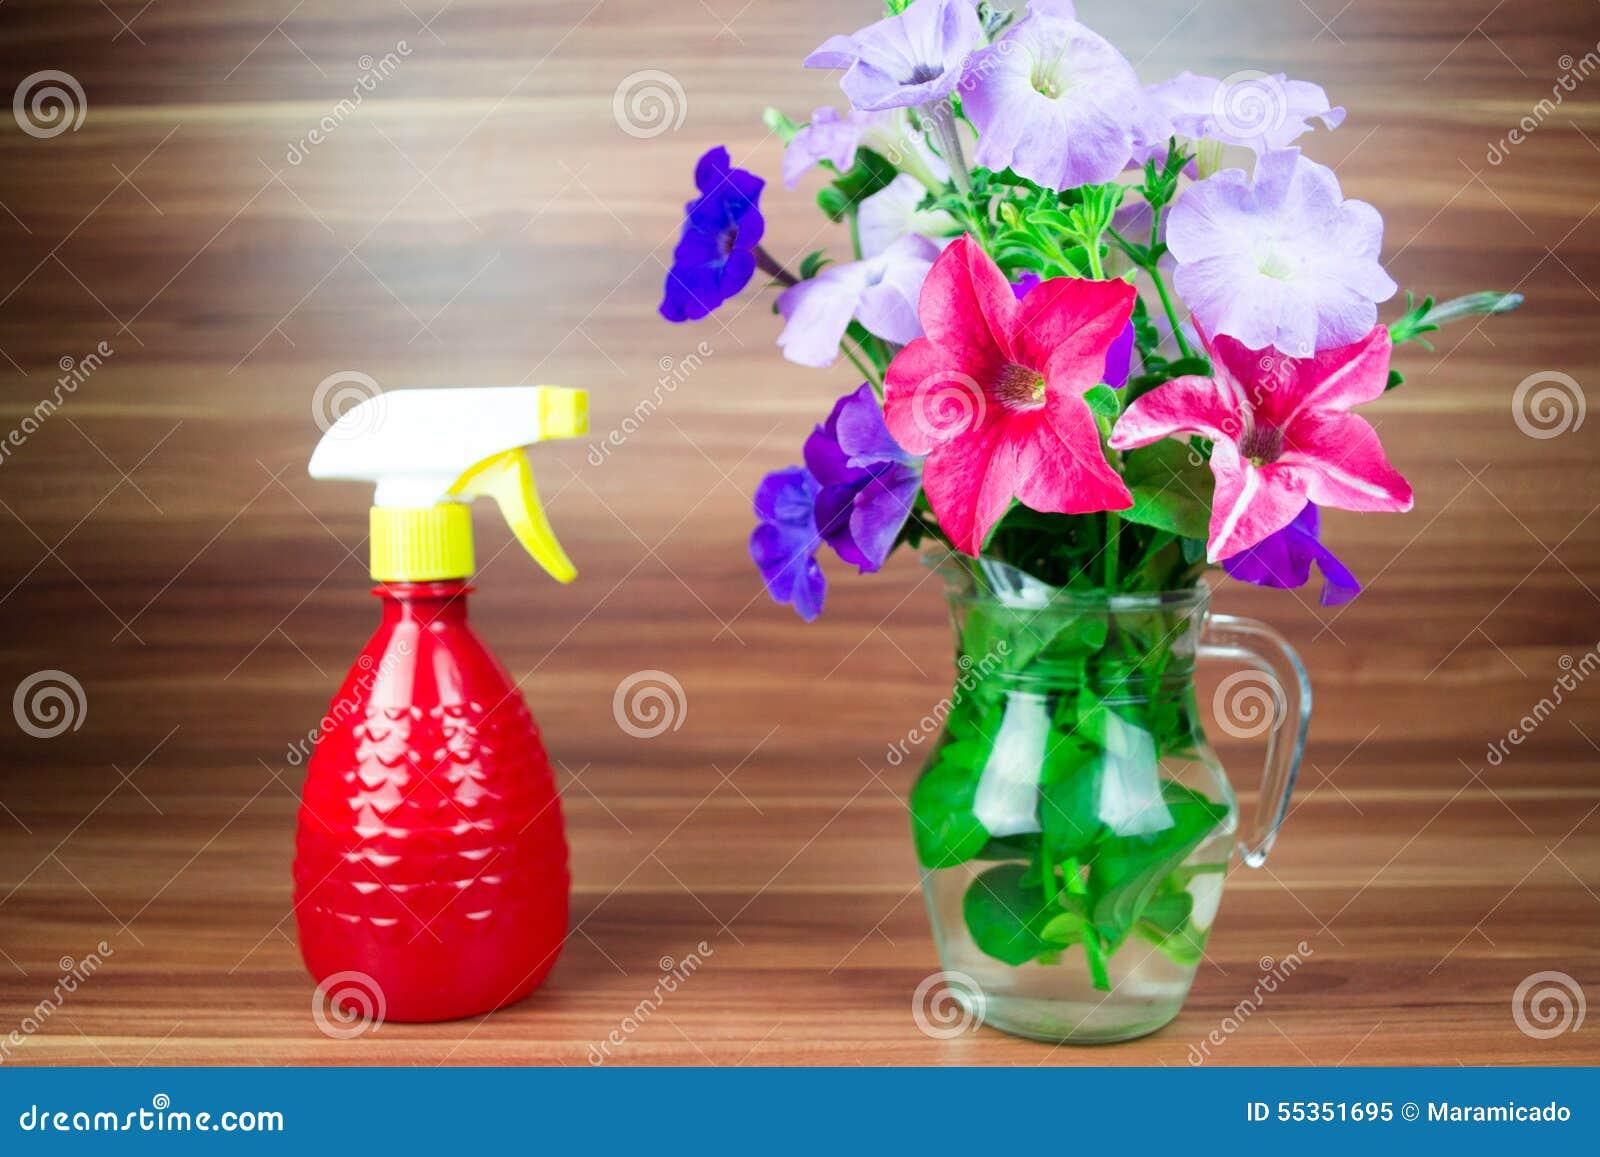 La petunia variopinta fiorisce in un lanciatore di vetro con l annaffiatoio